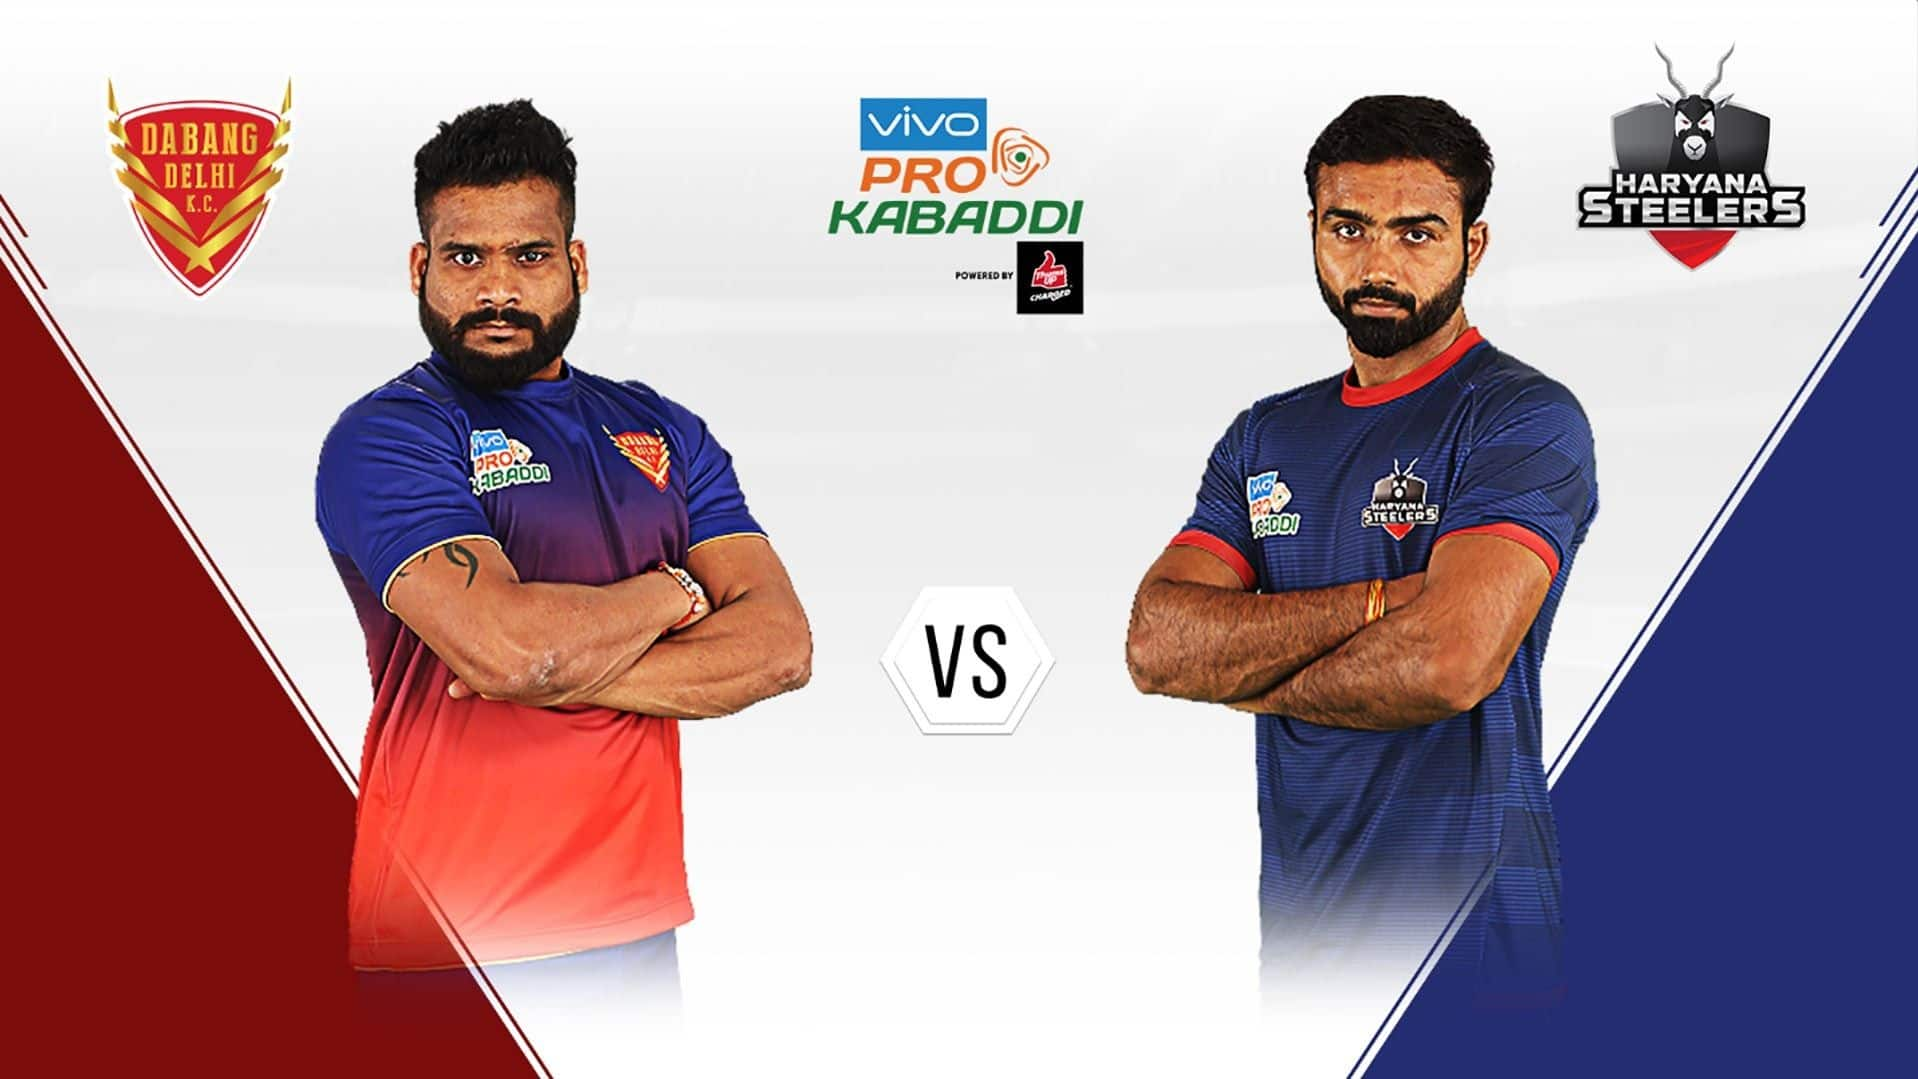 LIVE Dabang Delhi KC vs Haryana Steelers, Pro Kabaddi League 2019, live score, DEL vs HAR Live Score and Updates, Point by point update, DEL vs HAR, DEL vs HAR Live streaming, DEL vs HAR Live Scorecard, PKL 2019, Pro Kabaddi League 2019 Match 14, live DEL vs HAR, live score DEL vs HAR, live scorecard, DEL vs HAR Live, Live Score DEL vs HAR Match 14, Match 13 DEL vs HAR Live Updates